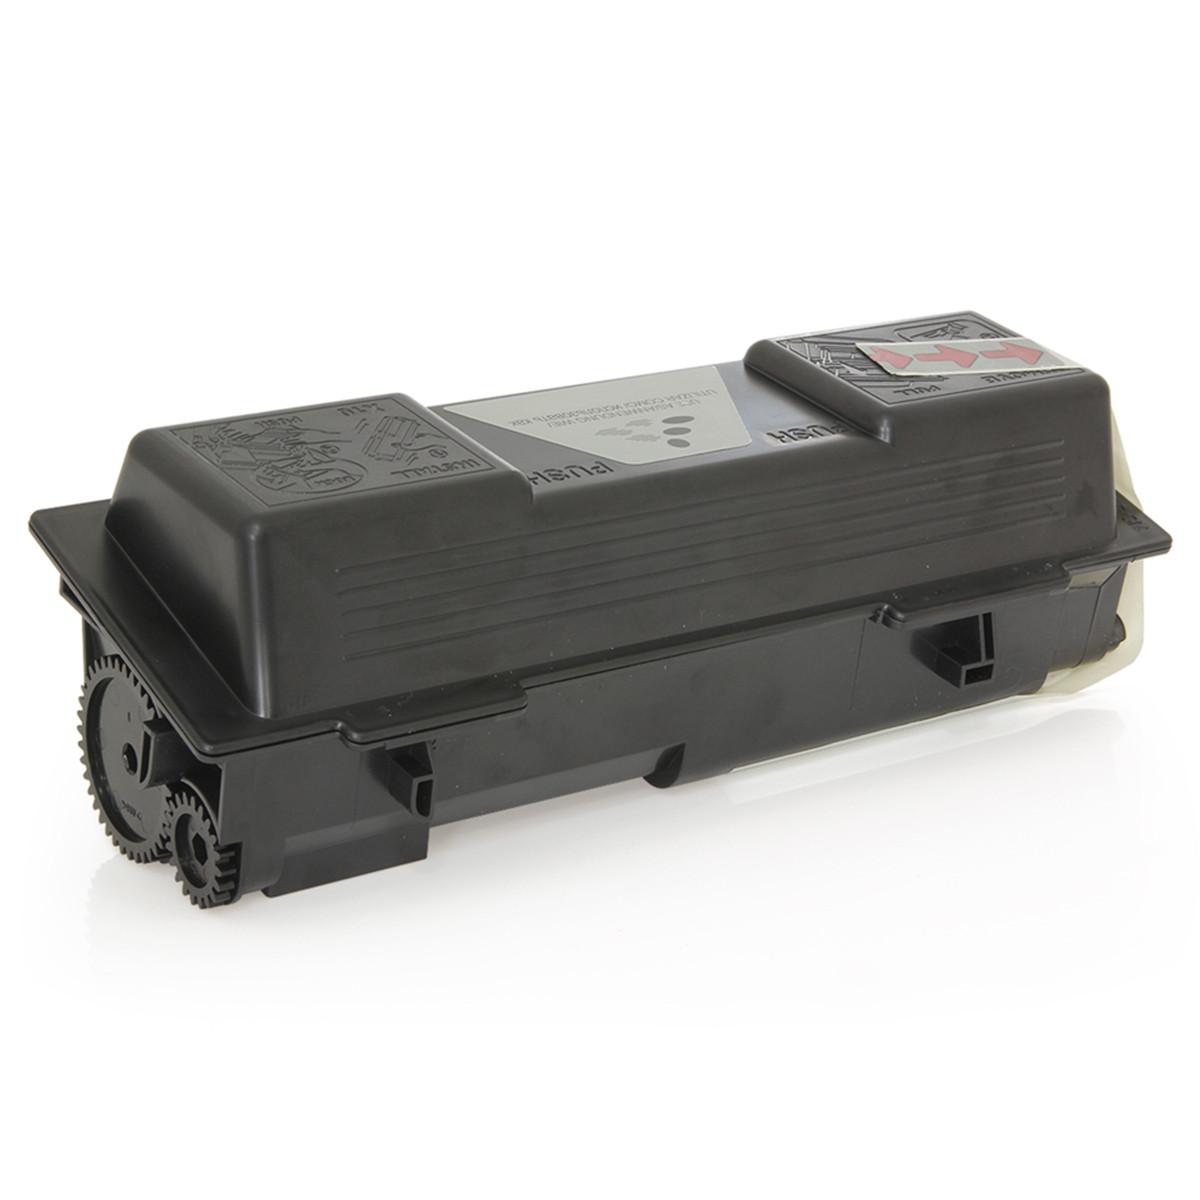 Toner Compatível com Kyocera TK1147   FS1035 FS1135 FS1035DP FS1035L FS1135 M2035DN   Importado 7.2k